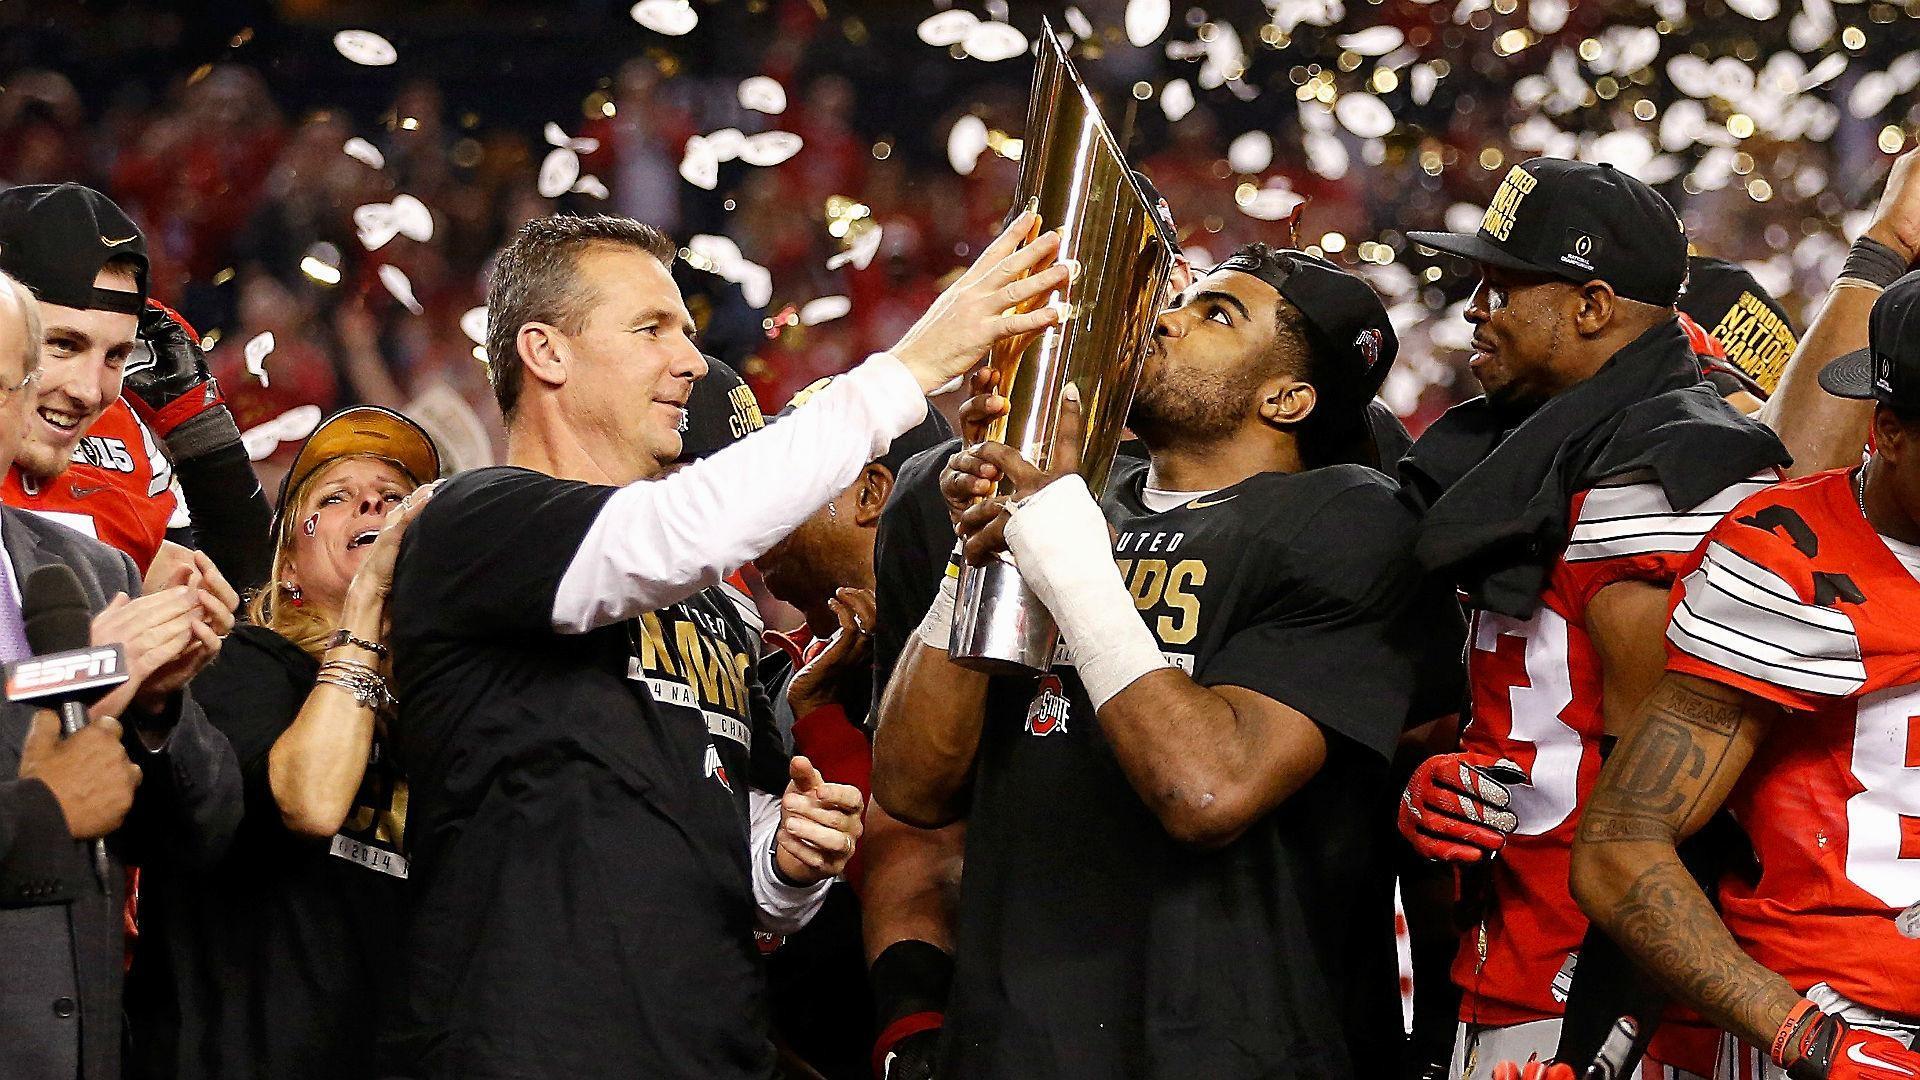 wallpaper.wiki-Ohio-States-latest-national-championship-rings-